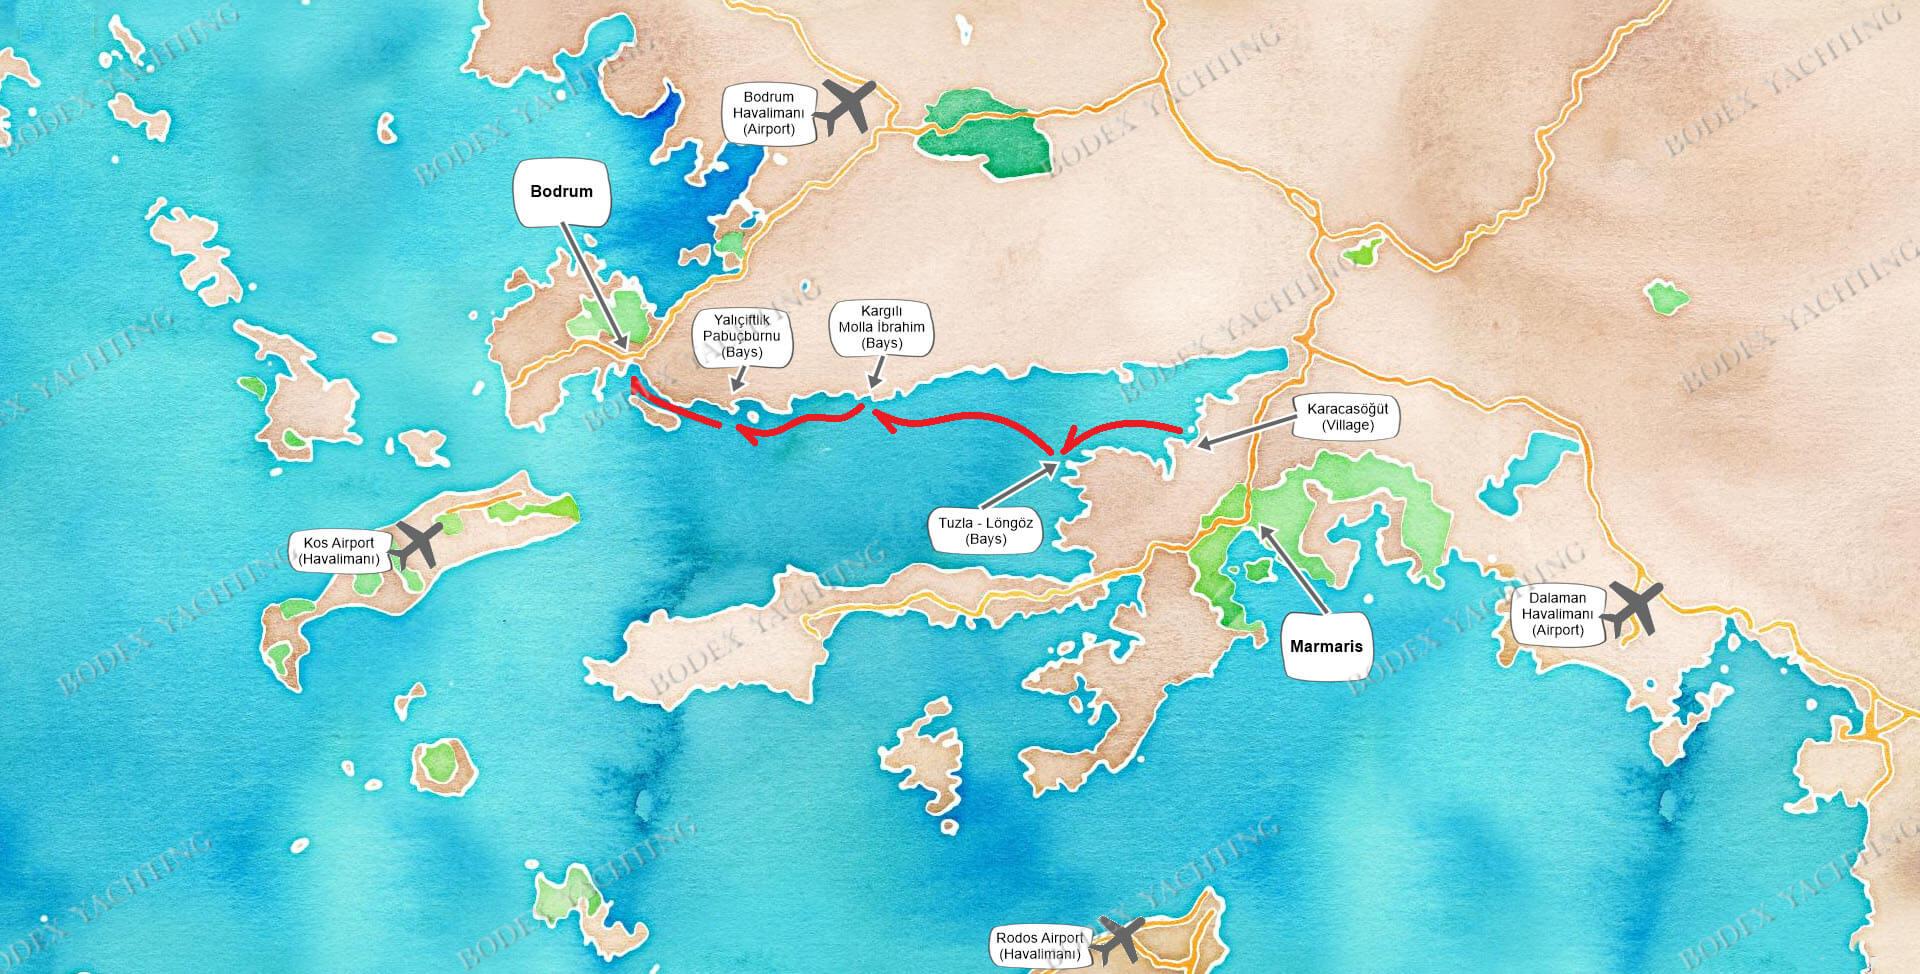 CABIN Charter - Karacasogut to Bodrum